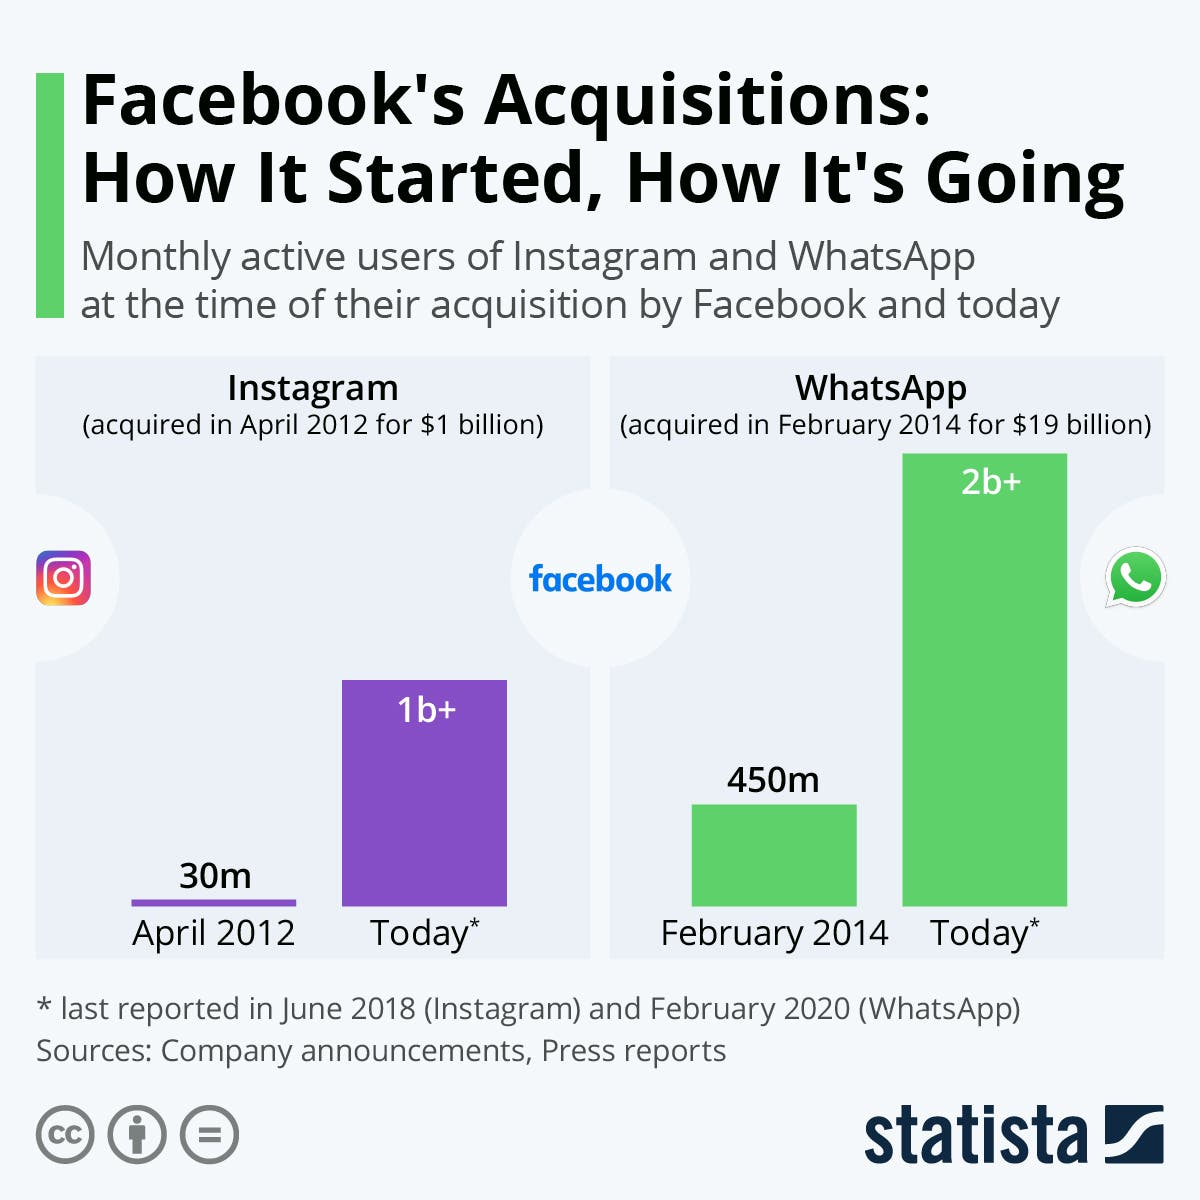 تطور عدد مستخدمي واتساب وإنستغرام